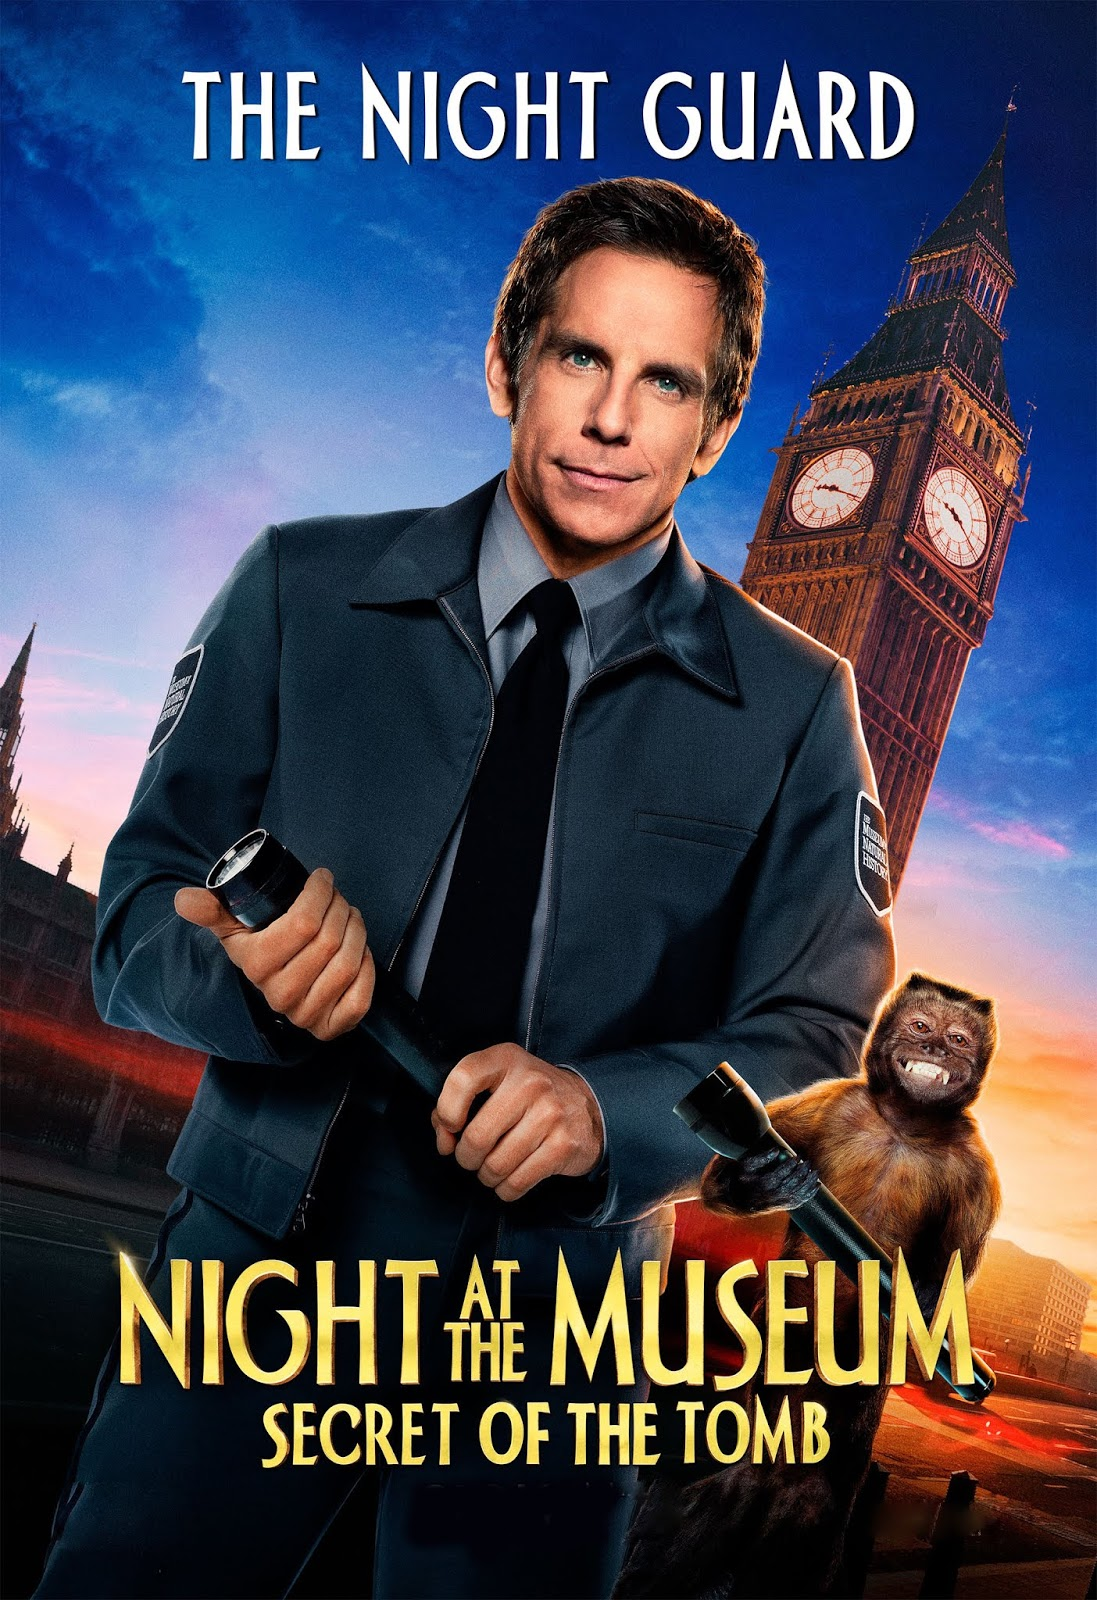 Night at the Museum 3 [2014] [DVD9] [NTSC] [Latino]